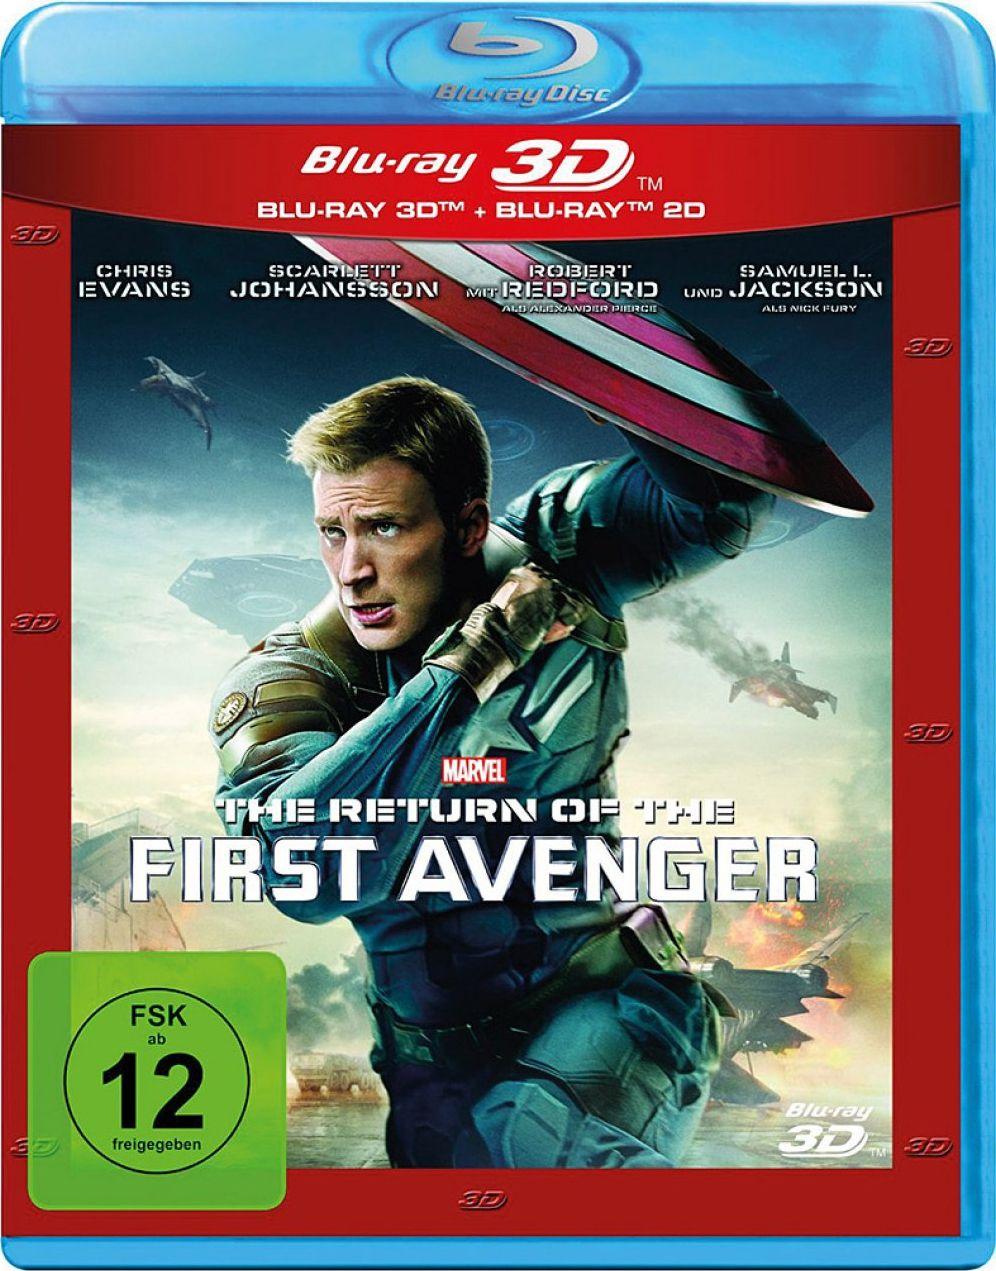 Return of the First Avenger, The 3D (BLURAY + BLURAY 3D)